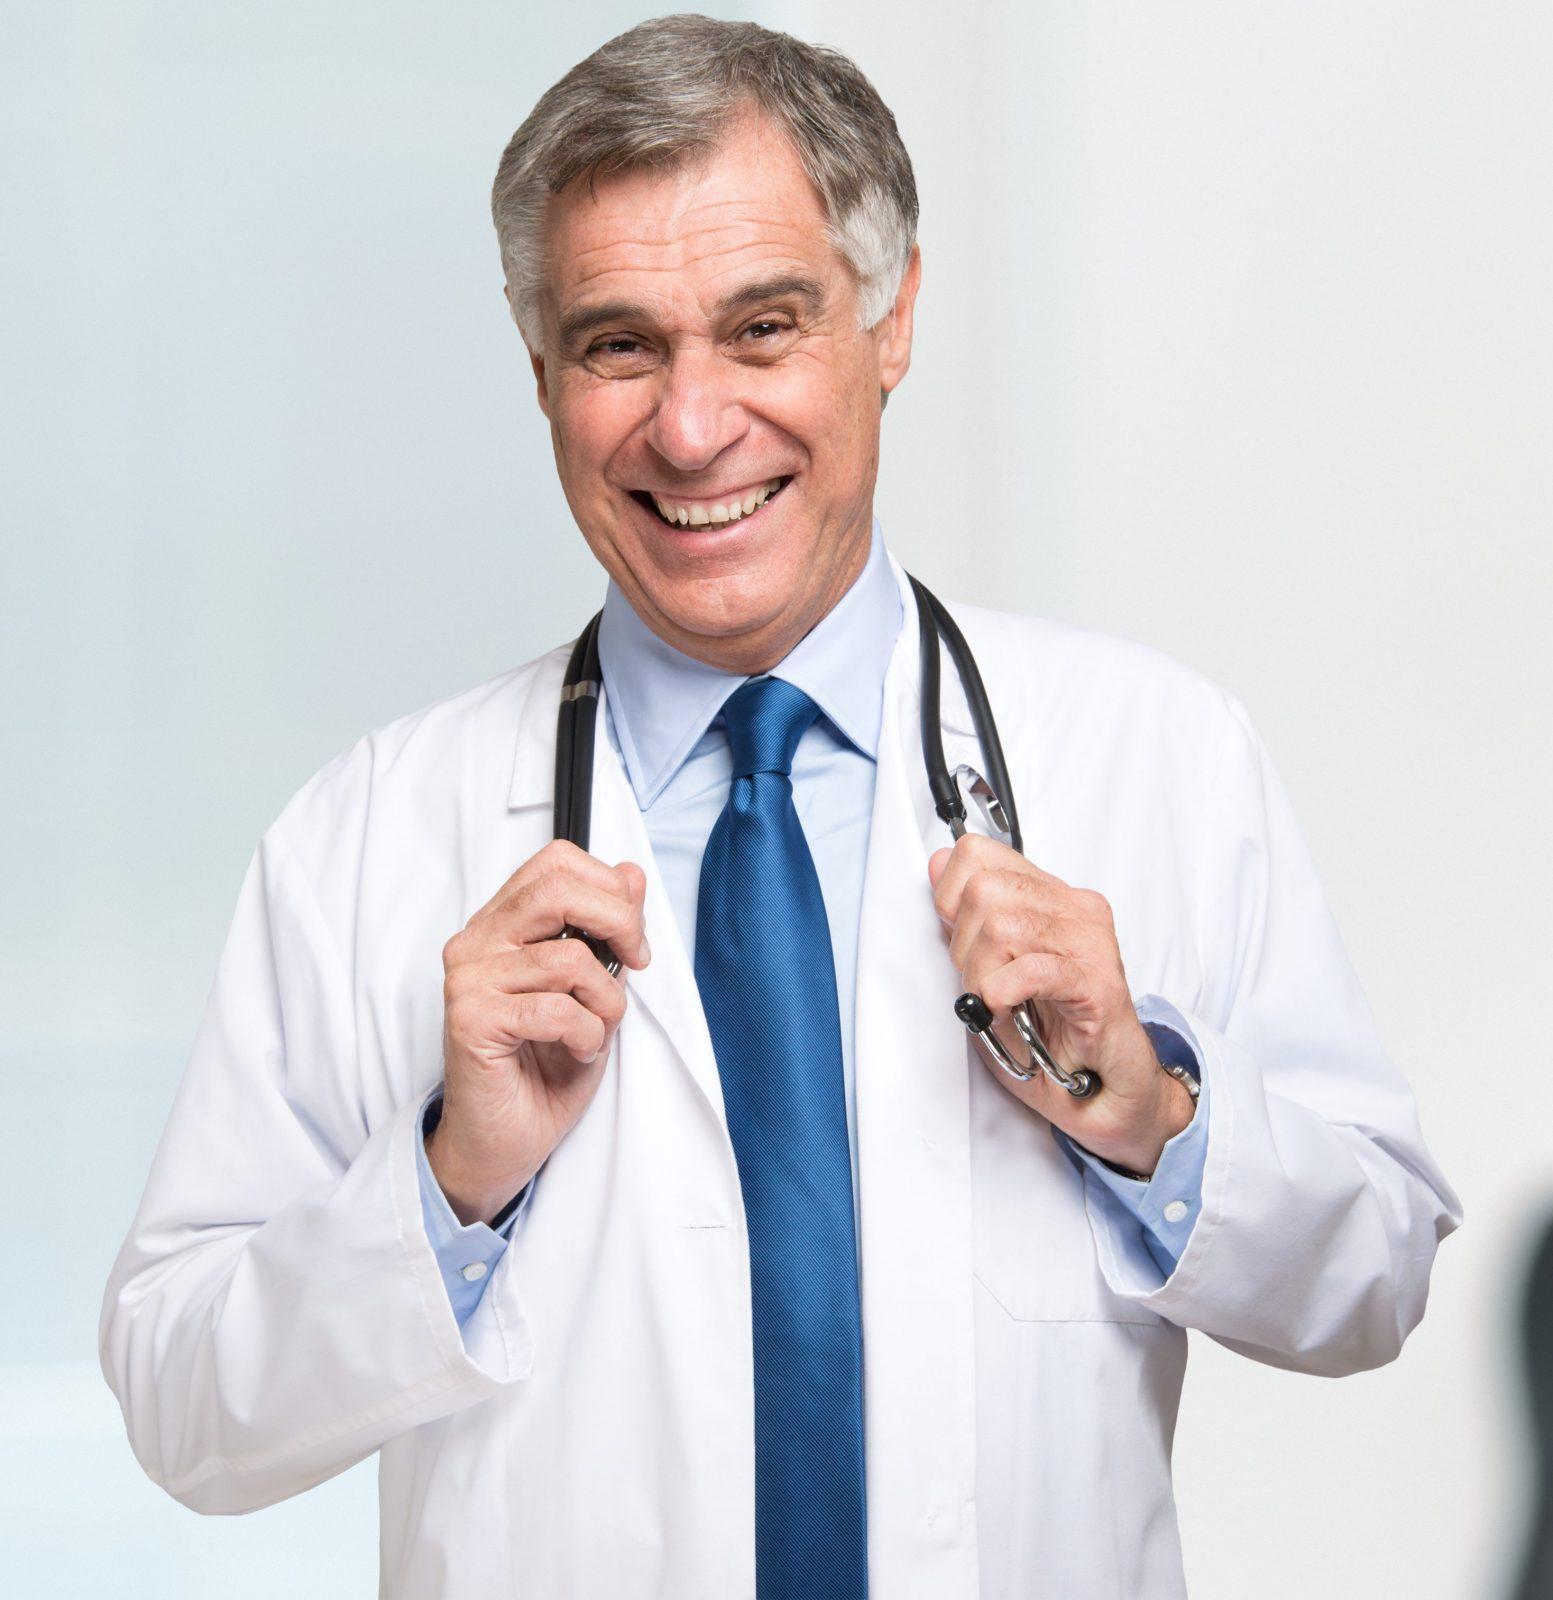 Румянцев Виталий Григорьевич - врач гастроэнтеролог